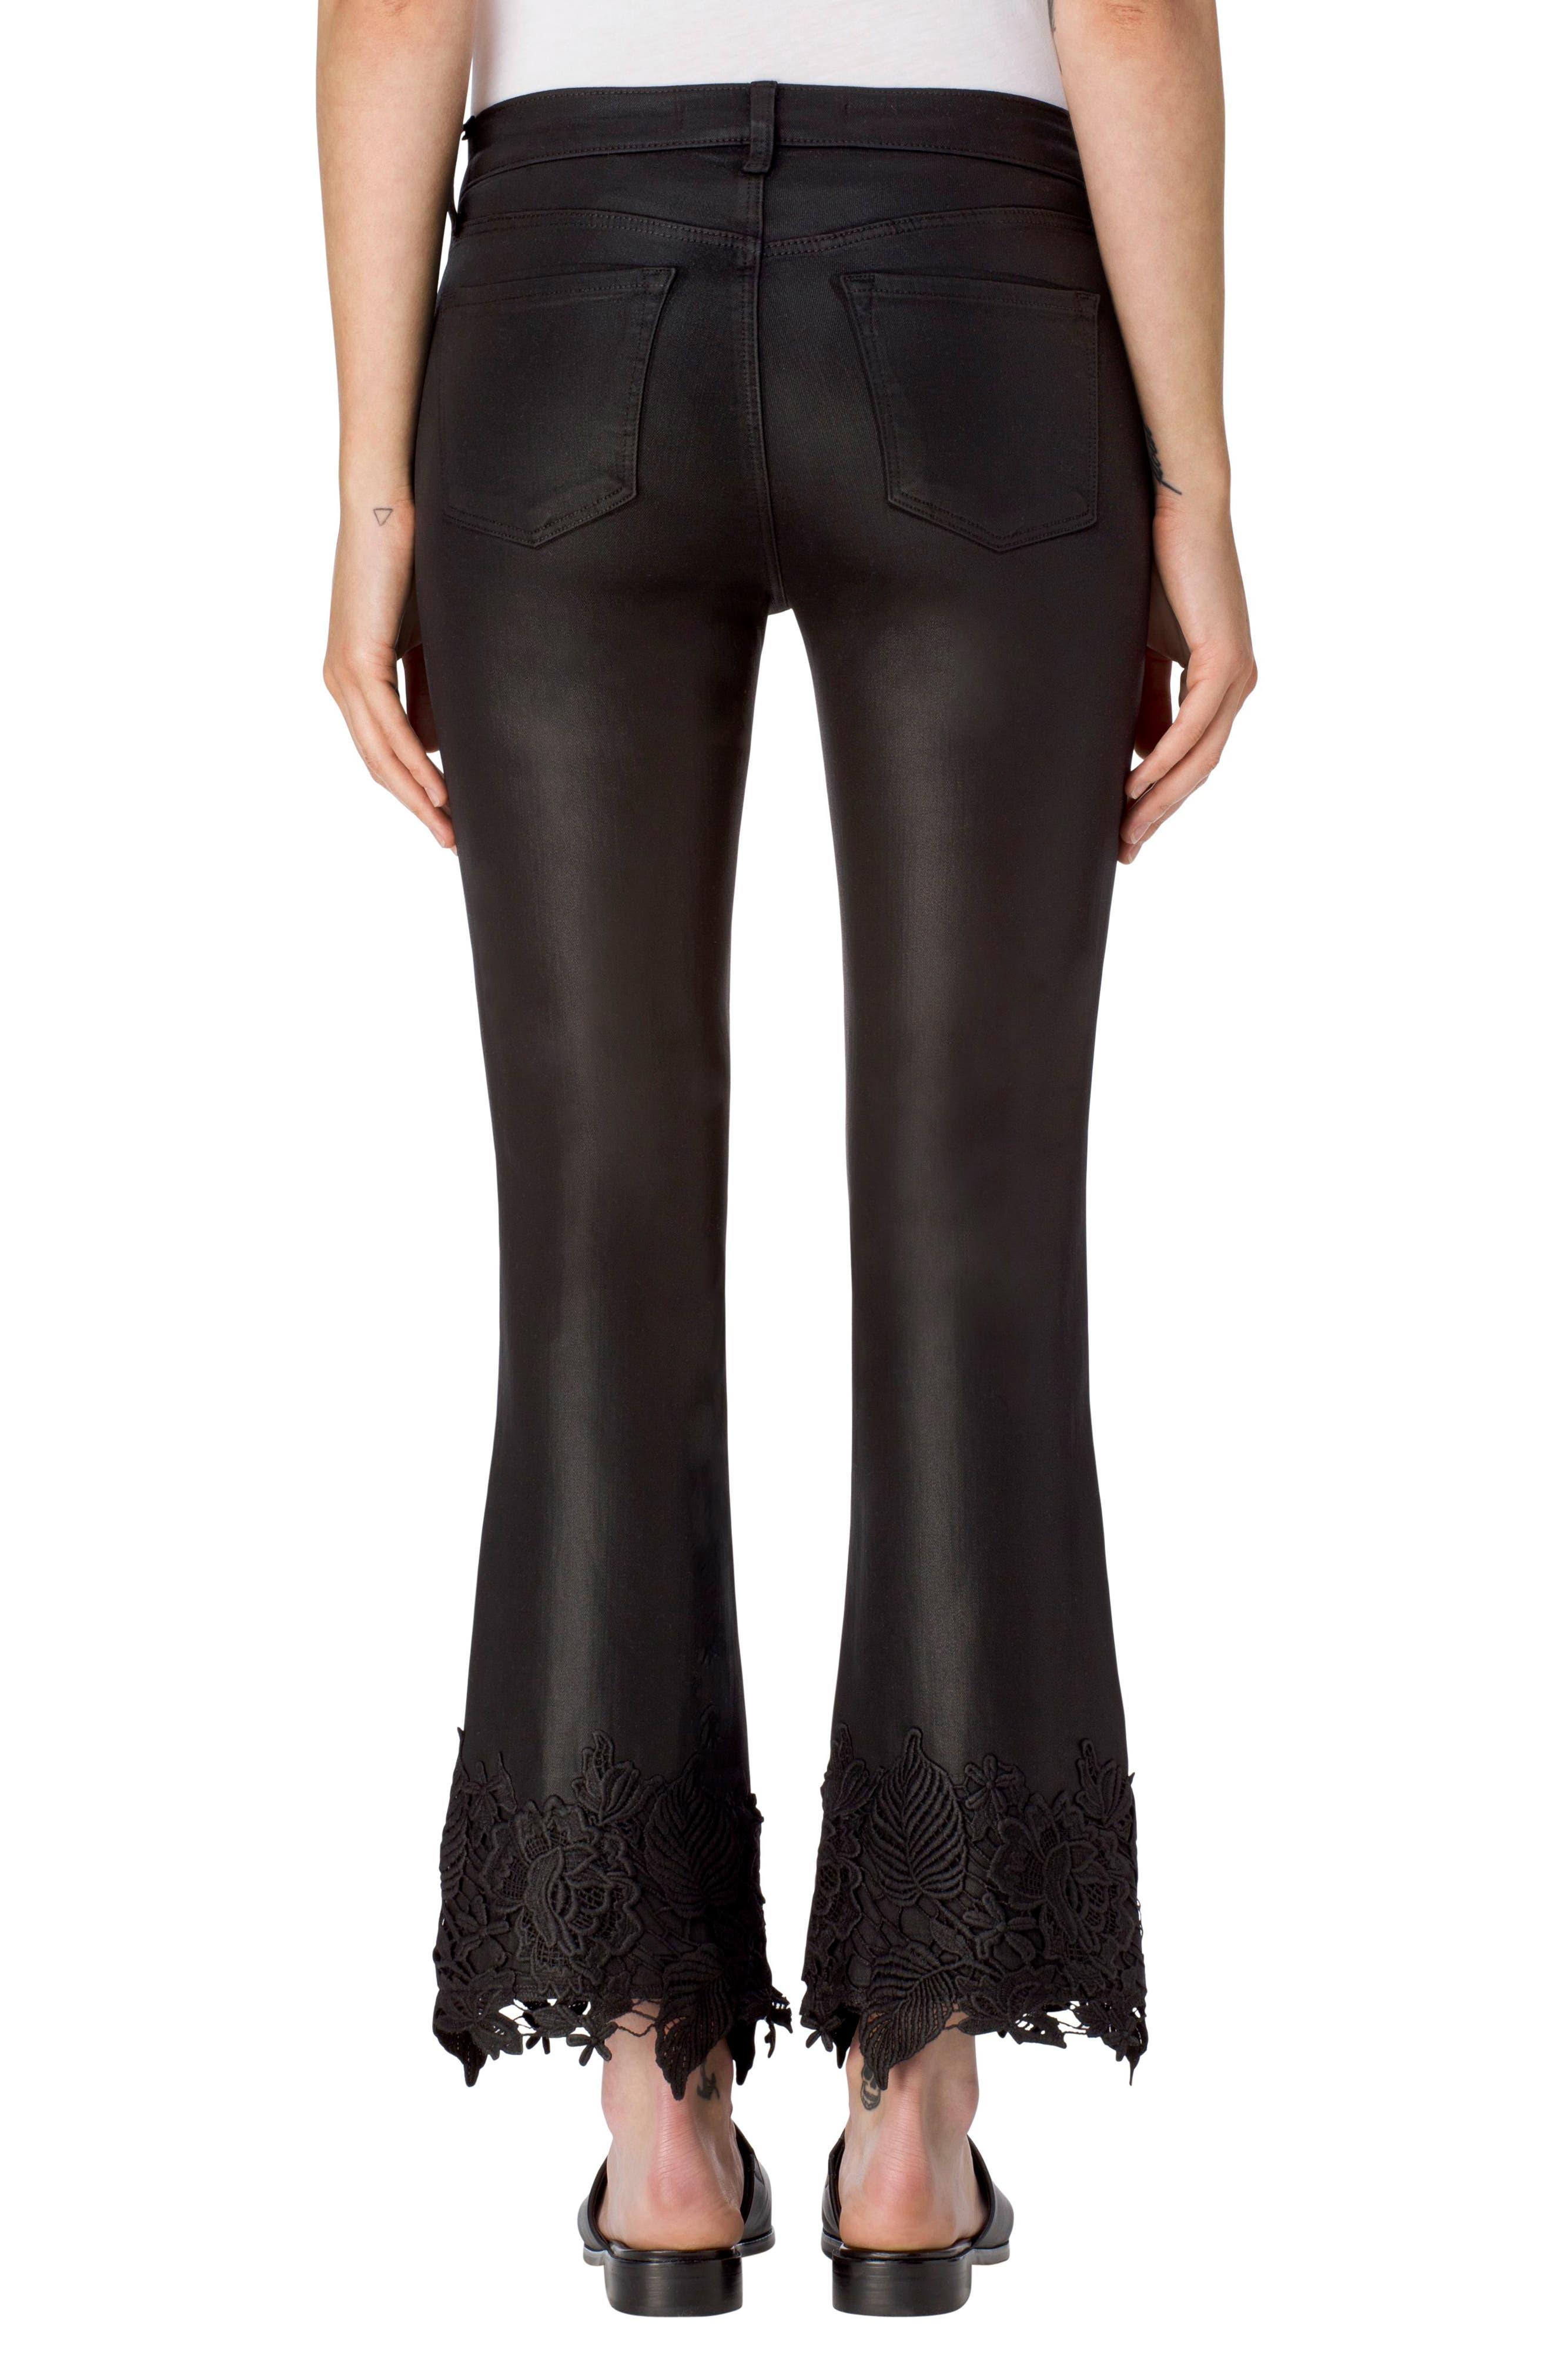 Alternate Image 2  - J Brand Selena Crop Bootcut Jeans (Coated Black Lace)